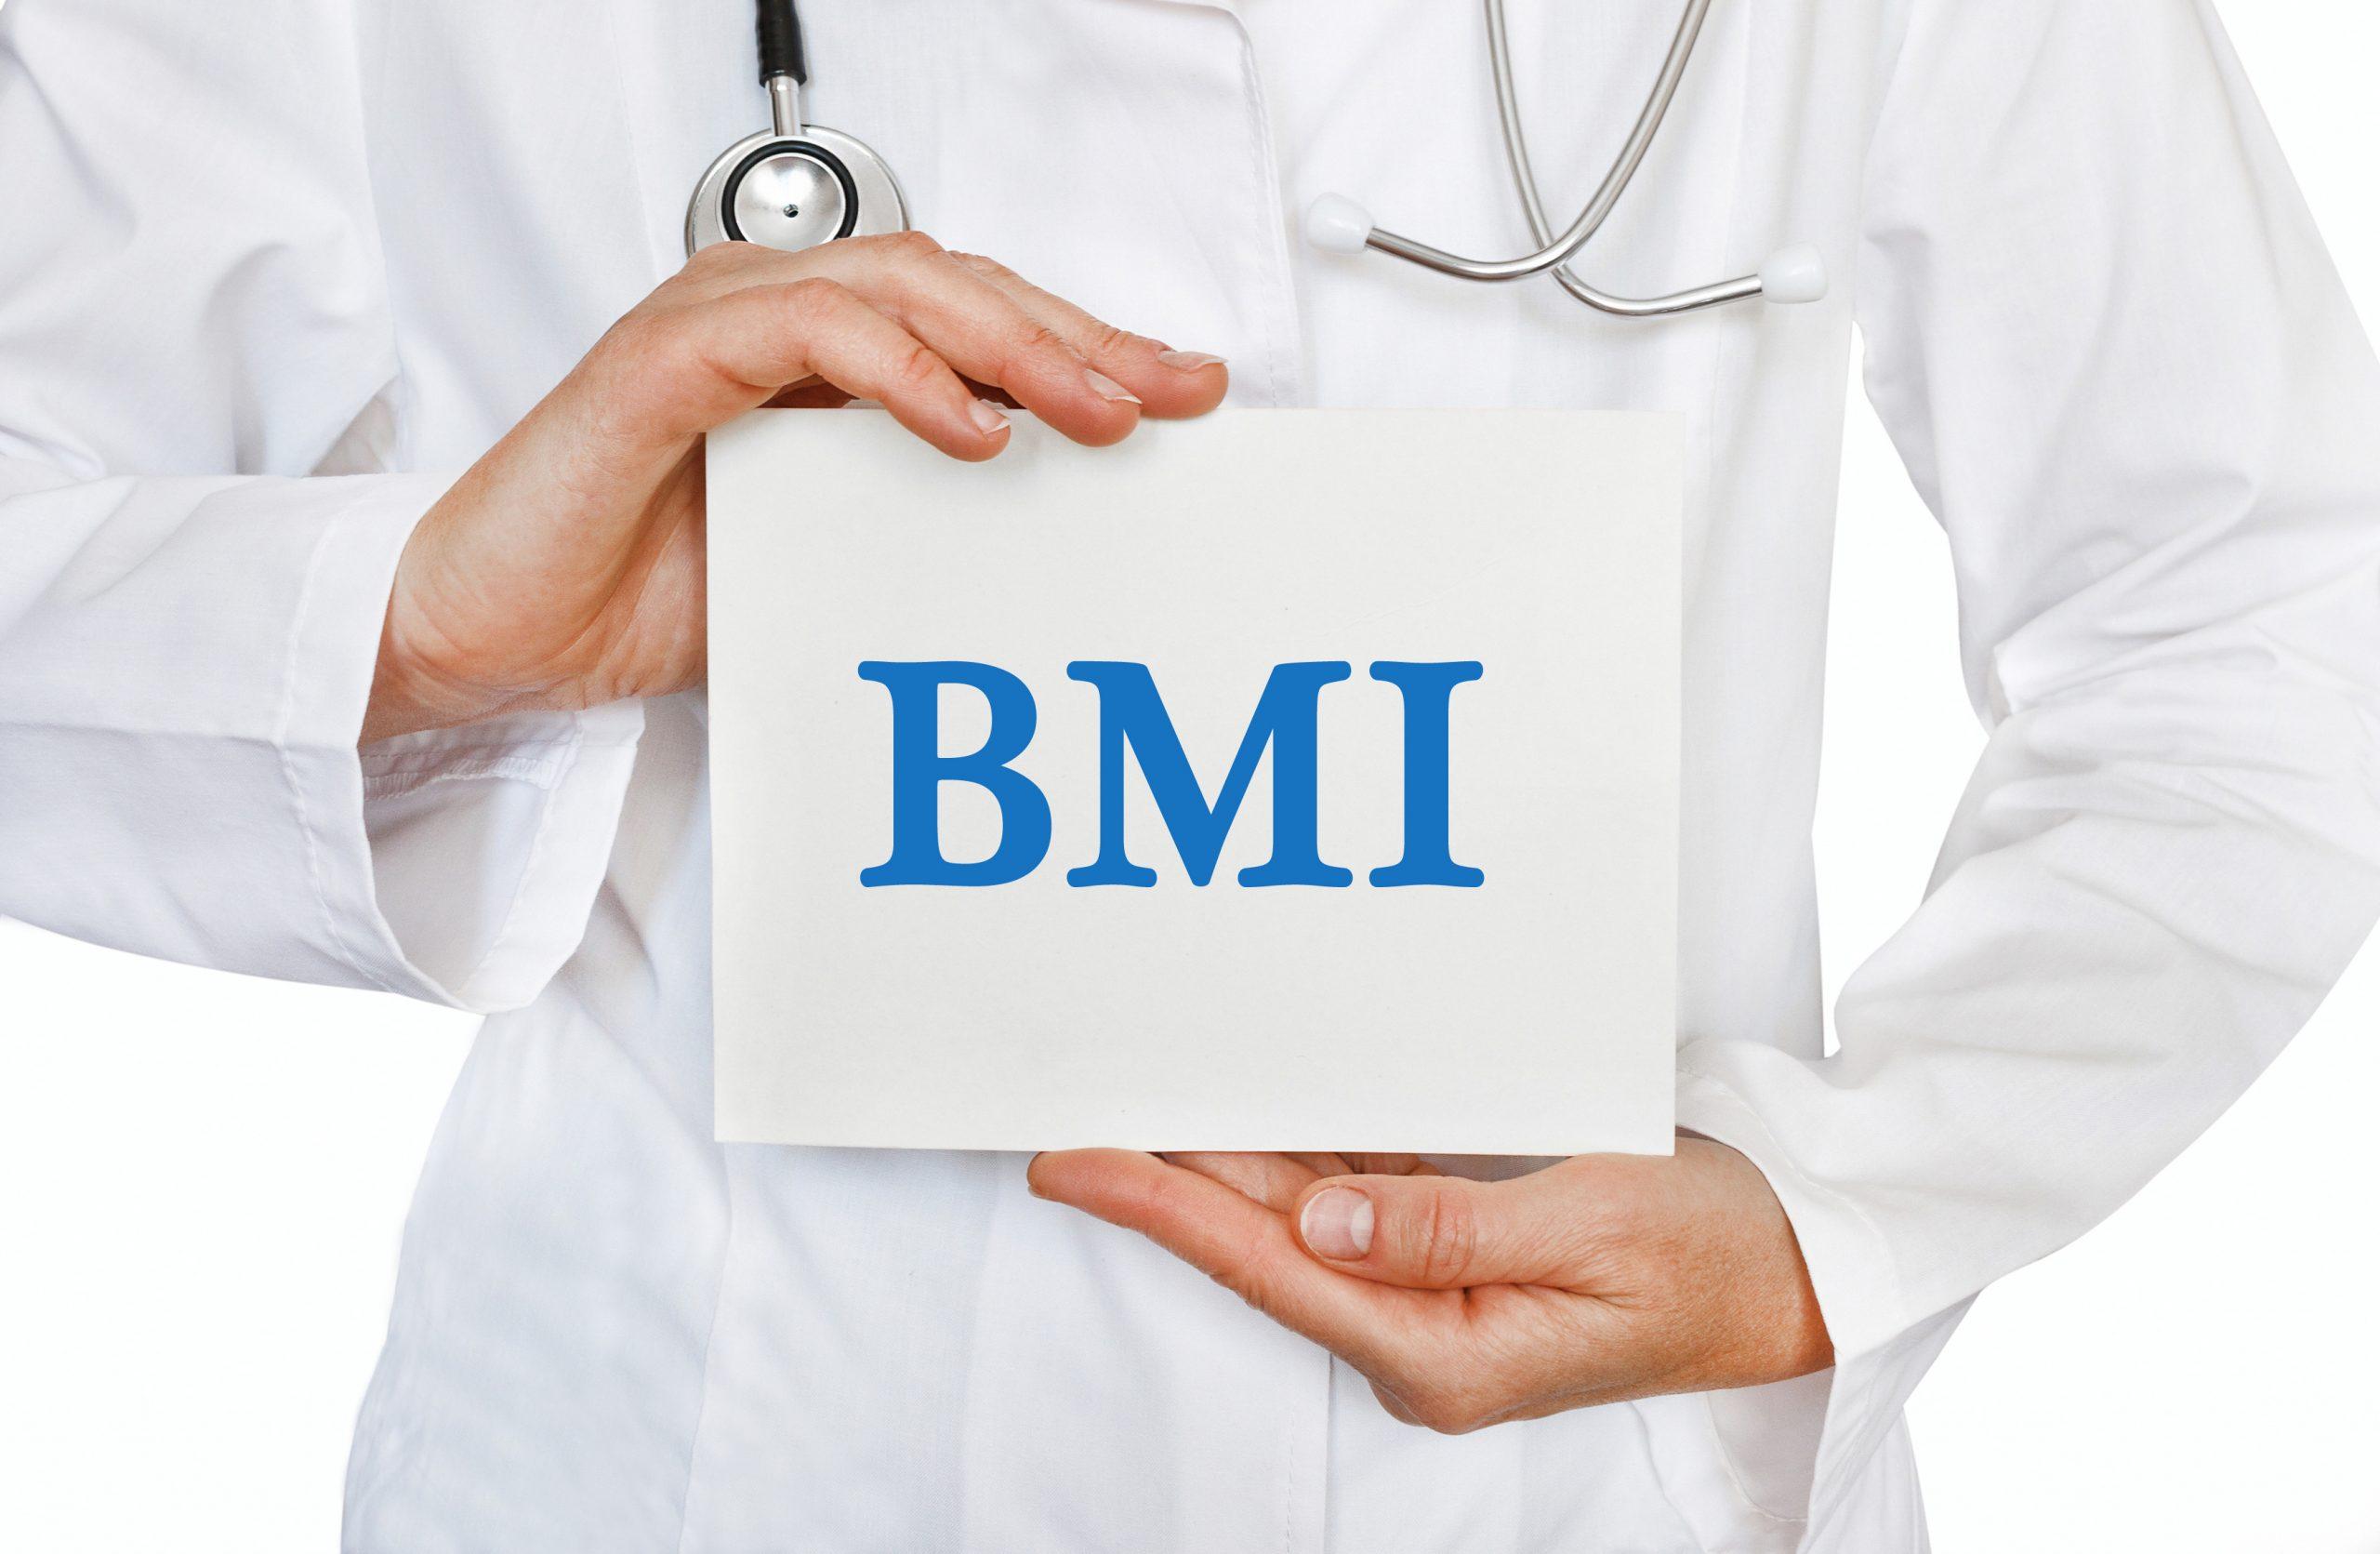 indice-BMI-perte-de-poids-suivi-graisse-corporelle-